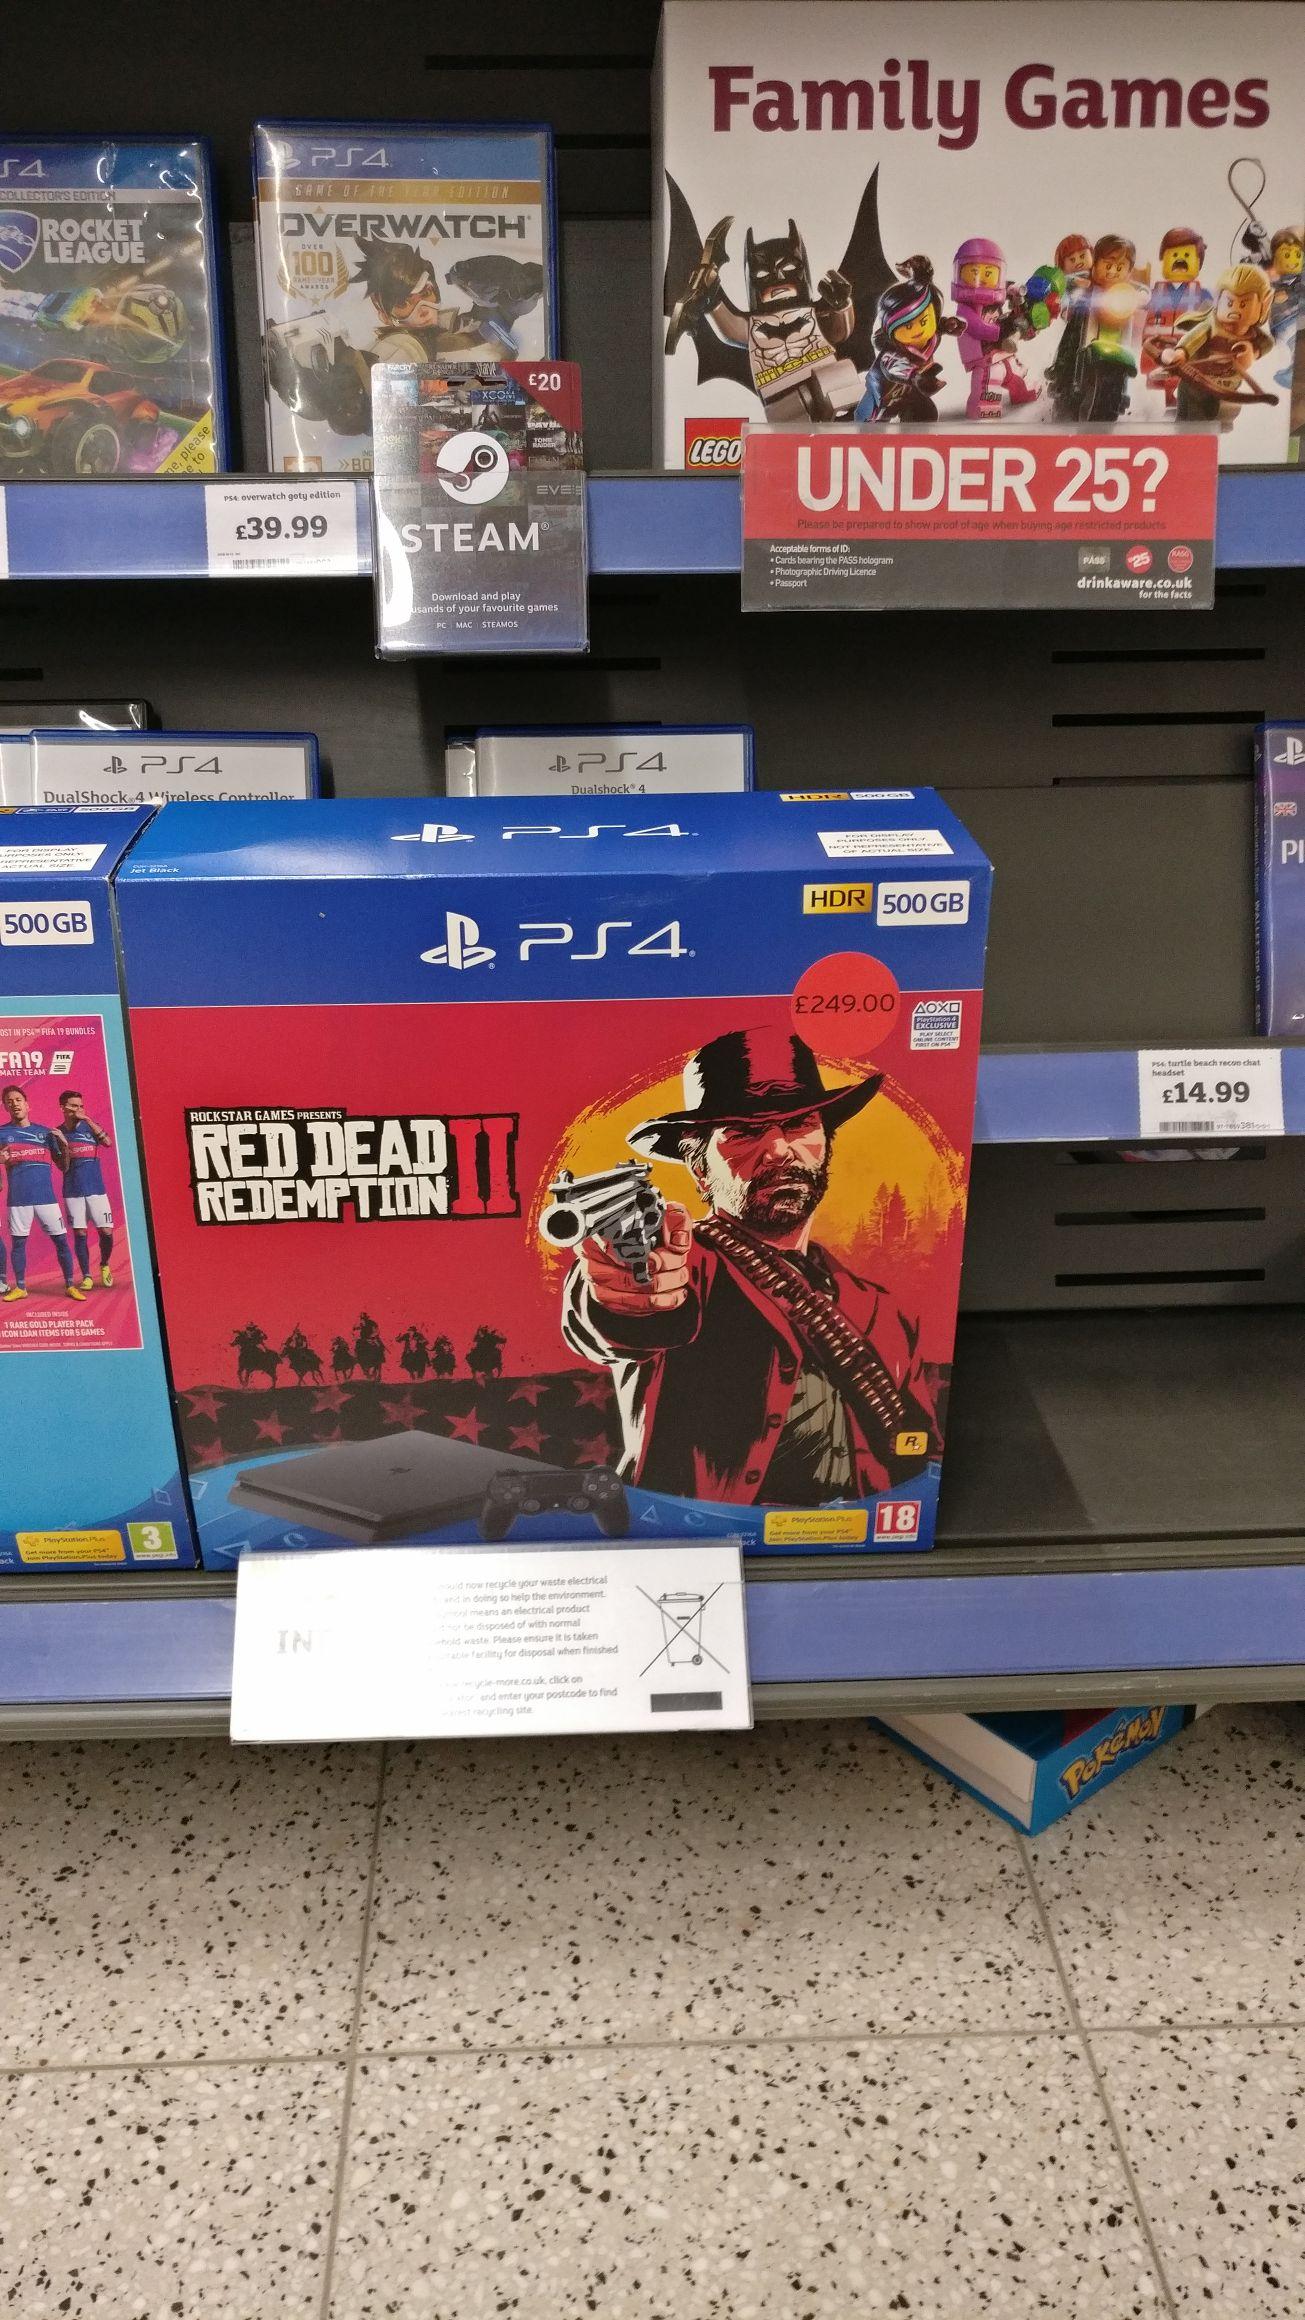 PlayStation 4 500gb + RDR 2 - £249 at Sainsbury's Reading in store